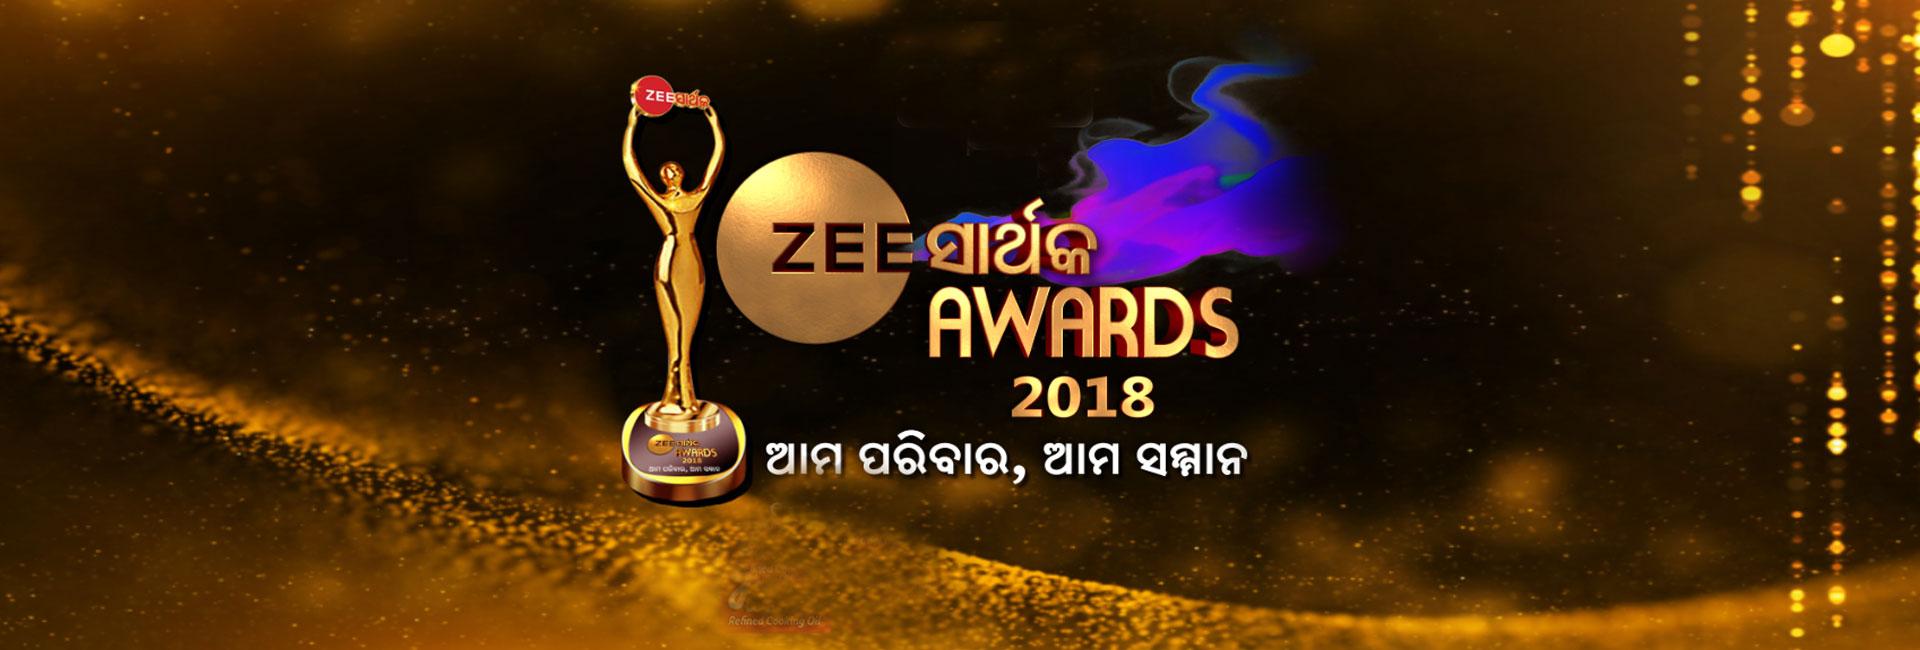 Zee Sarthak Awards 2018